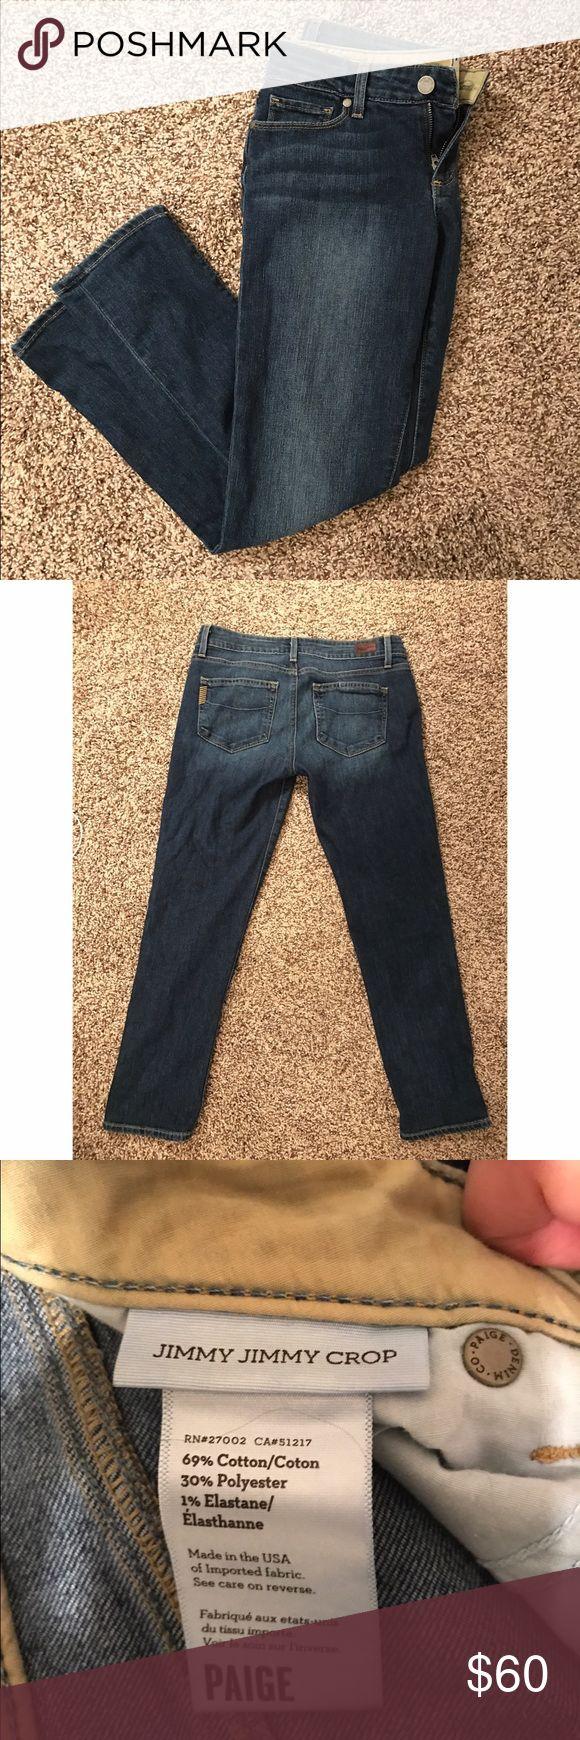 Paige Jimmy Jimmy Crop Jeans Paige Jimmy Jimmy crop jeans. Dark denim, size 25. Excellent condition! Paige Jeans Jeans Ankle & Cropped